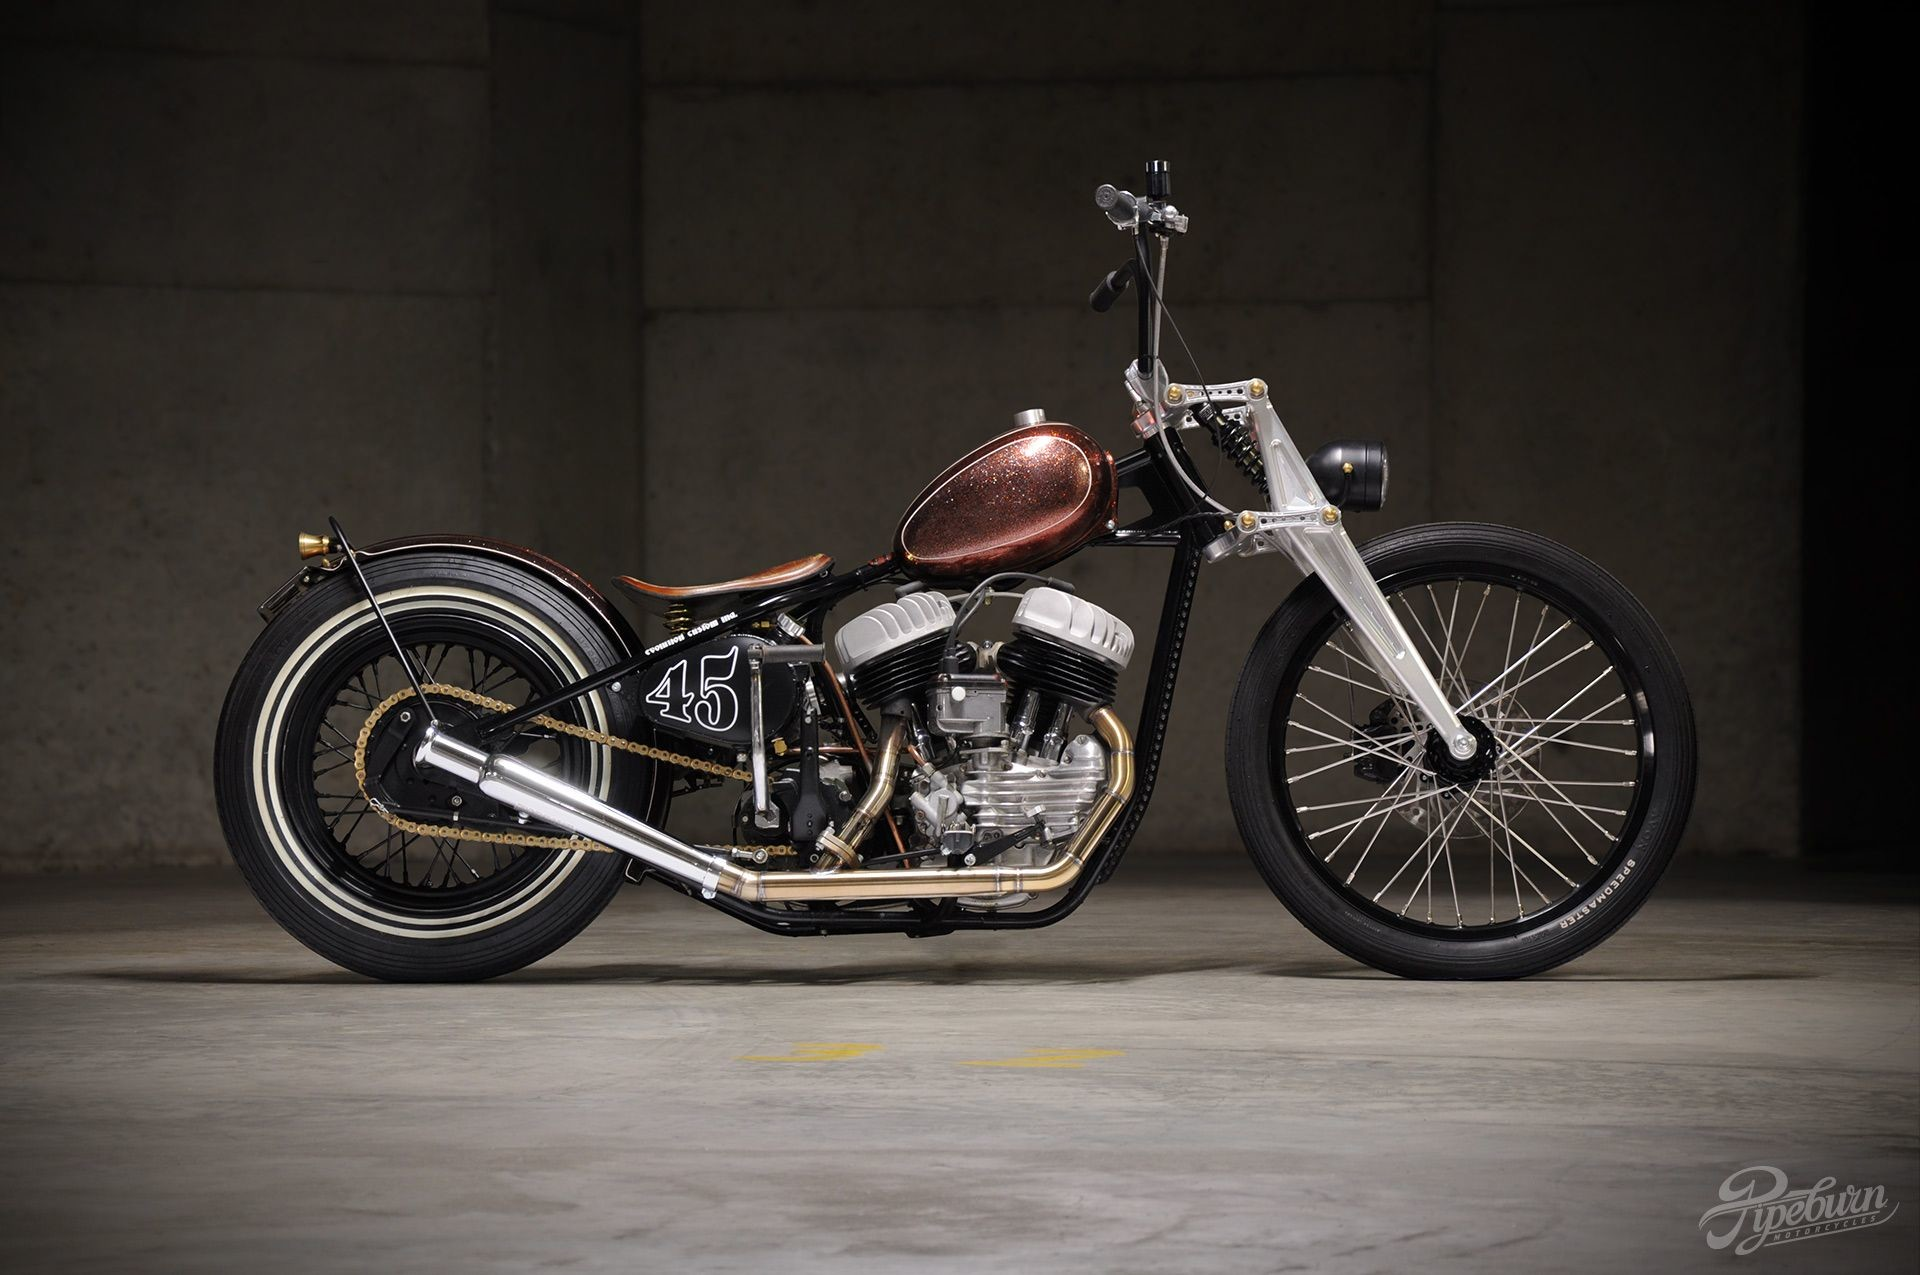 Res: 1920x1275, Harley-Davidson-Wallpaper-High-Definition.jpg